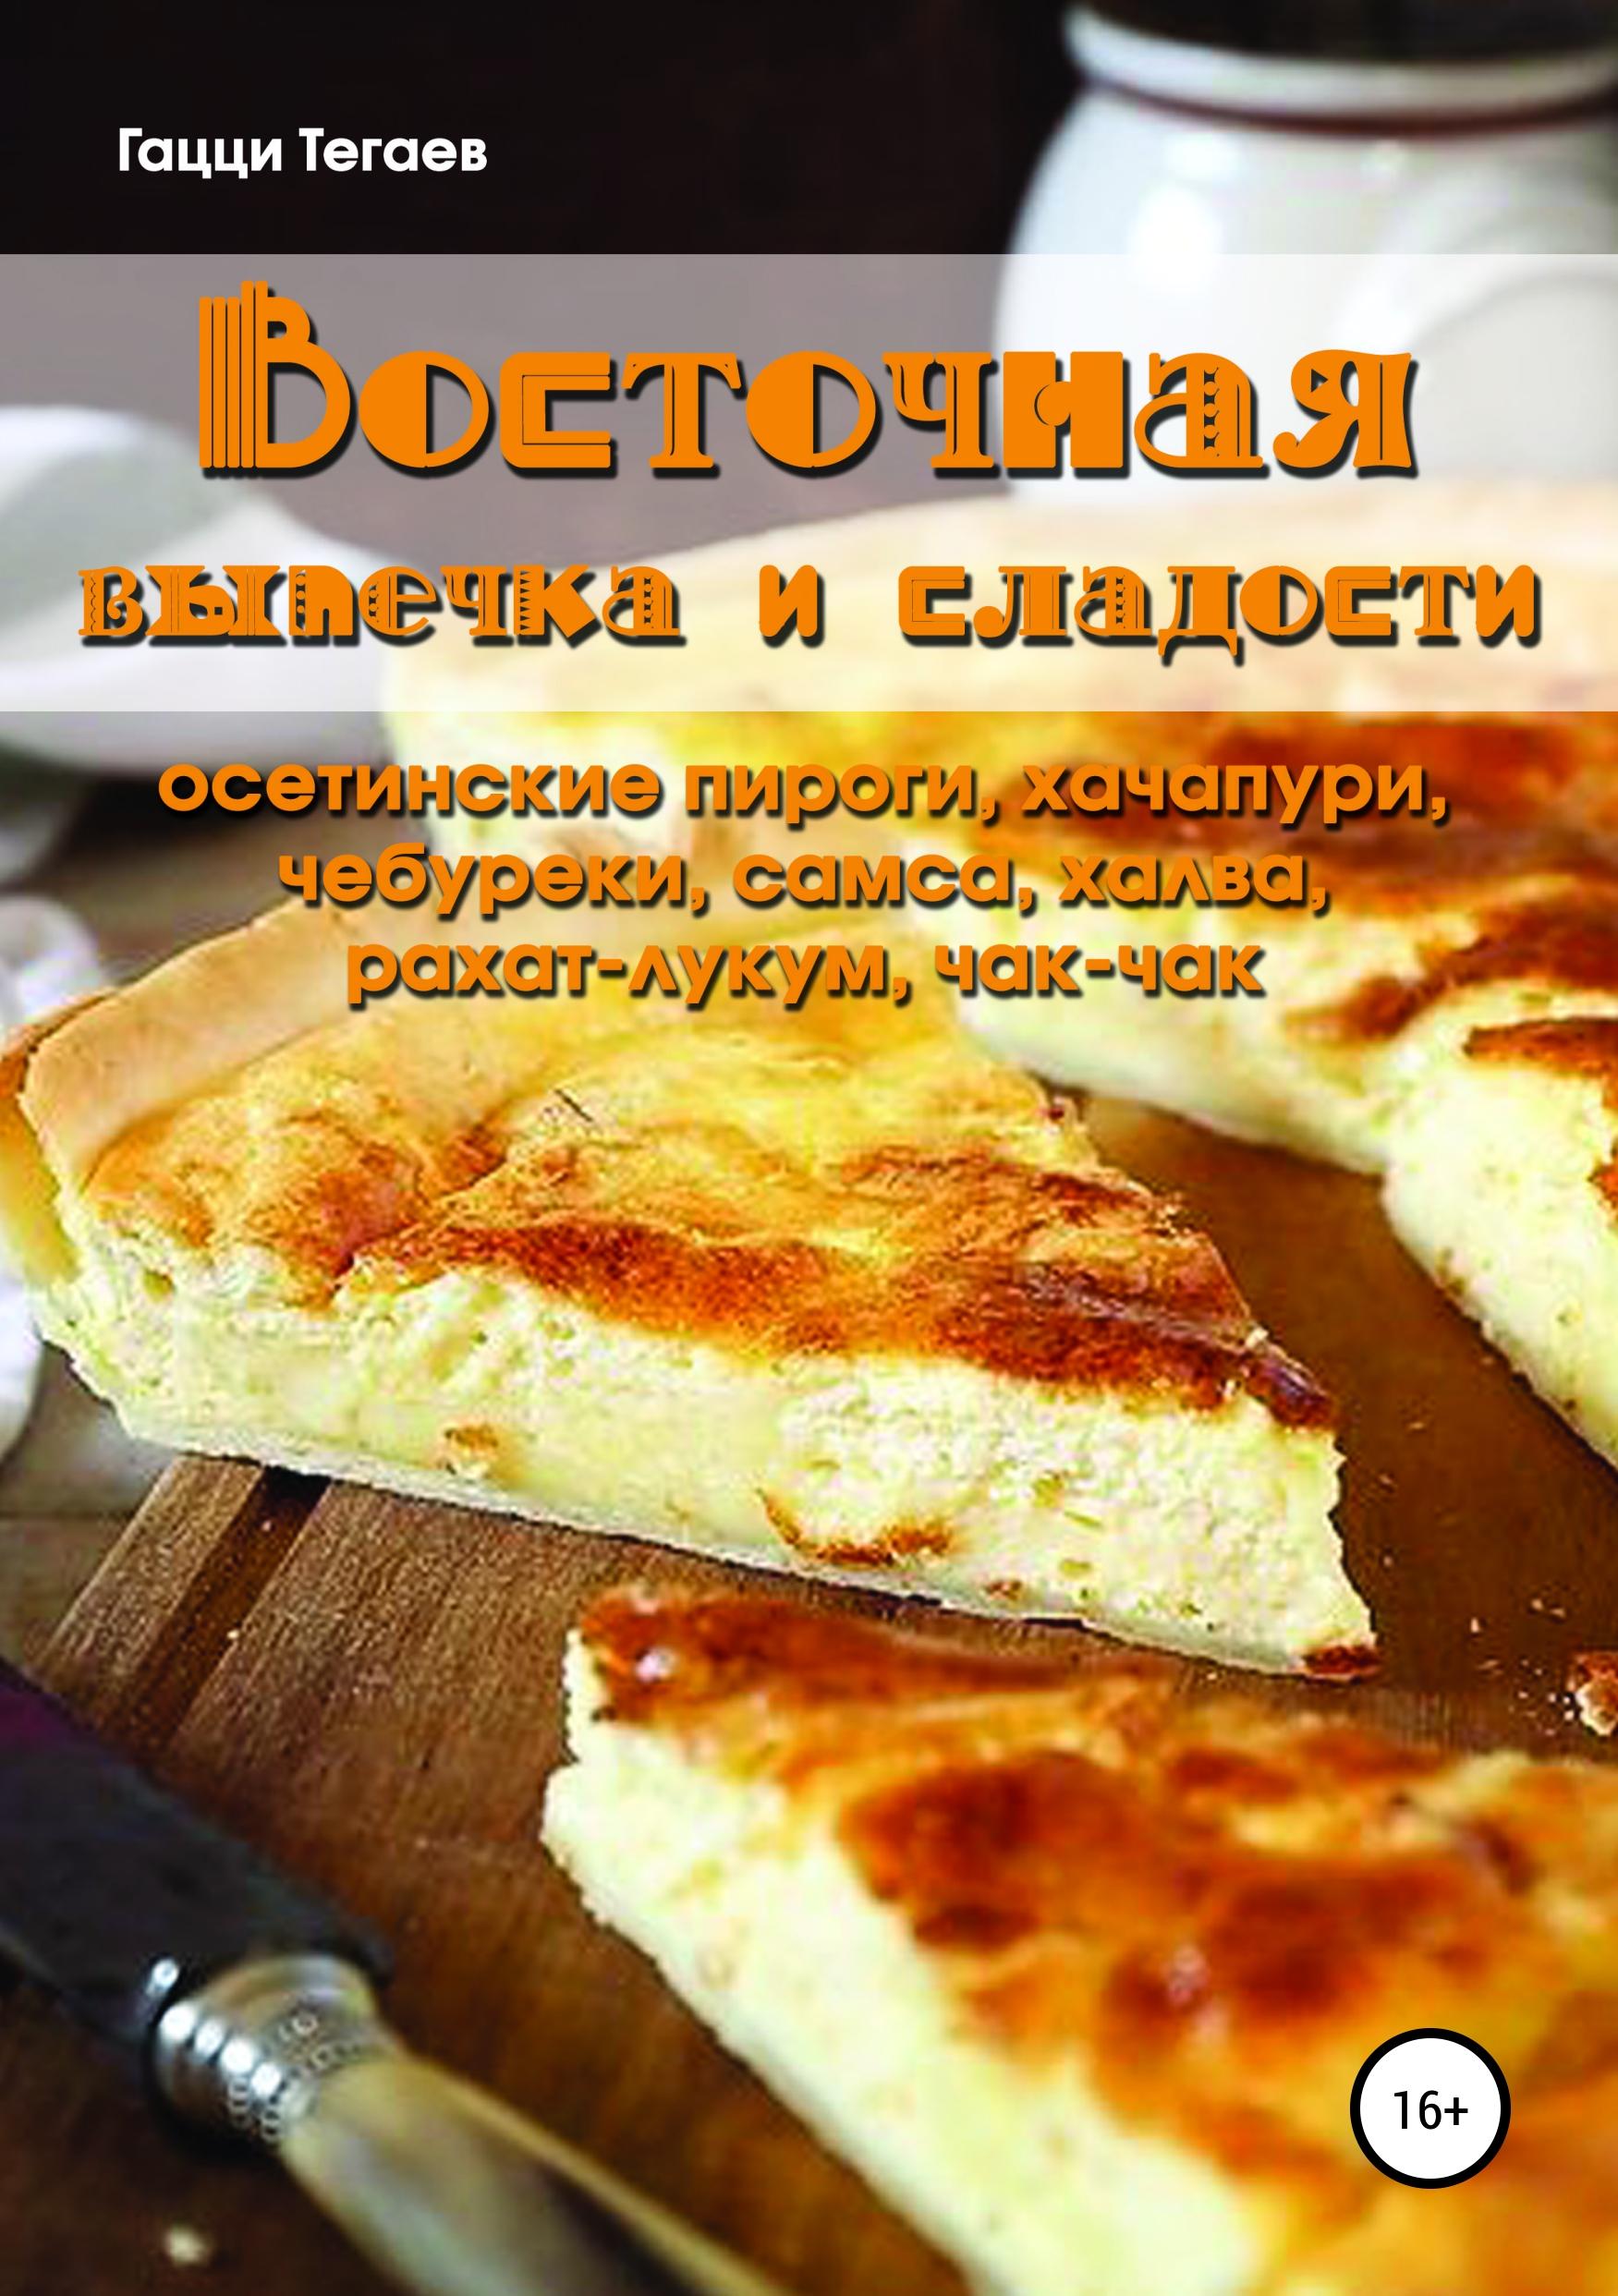 Гацци Тегаев Восточная выпечка и сладости: осетинские пироги, хачапури, чебуреки, самса, халва, рахат-лукум, чак-чак